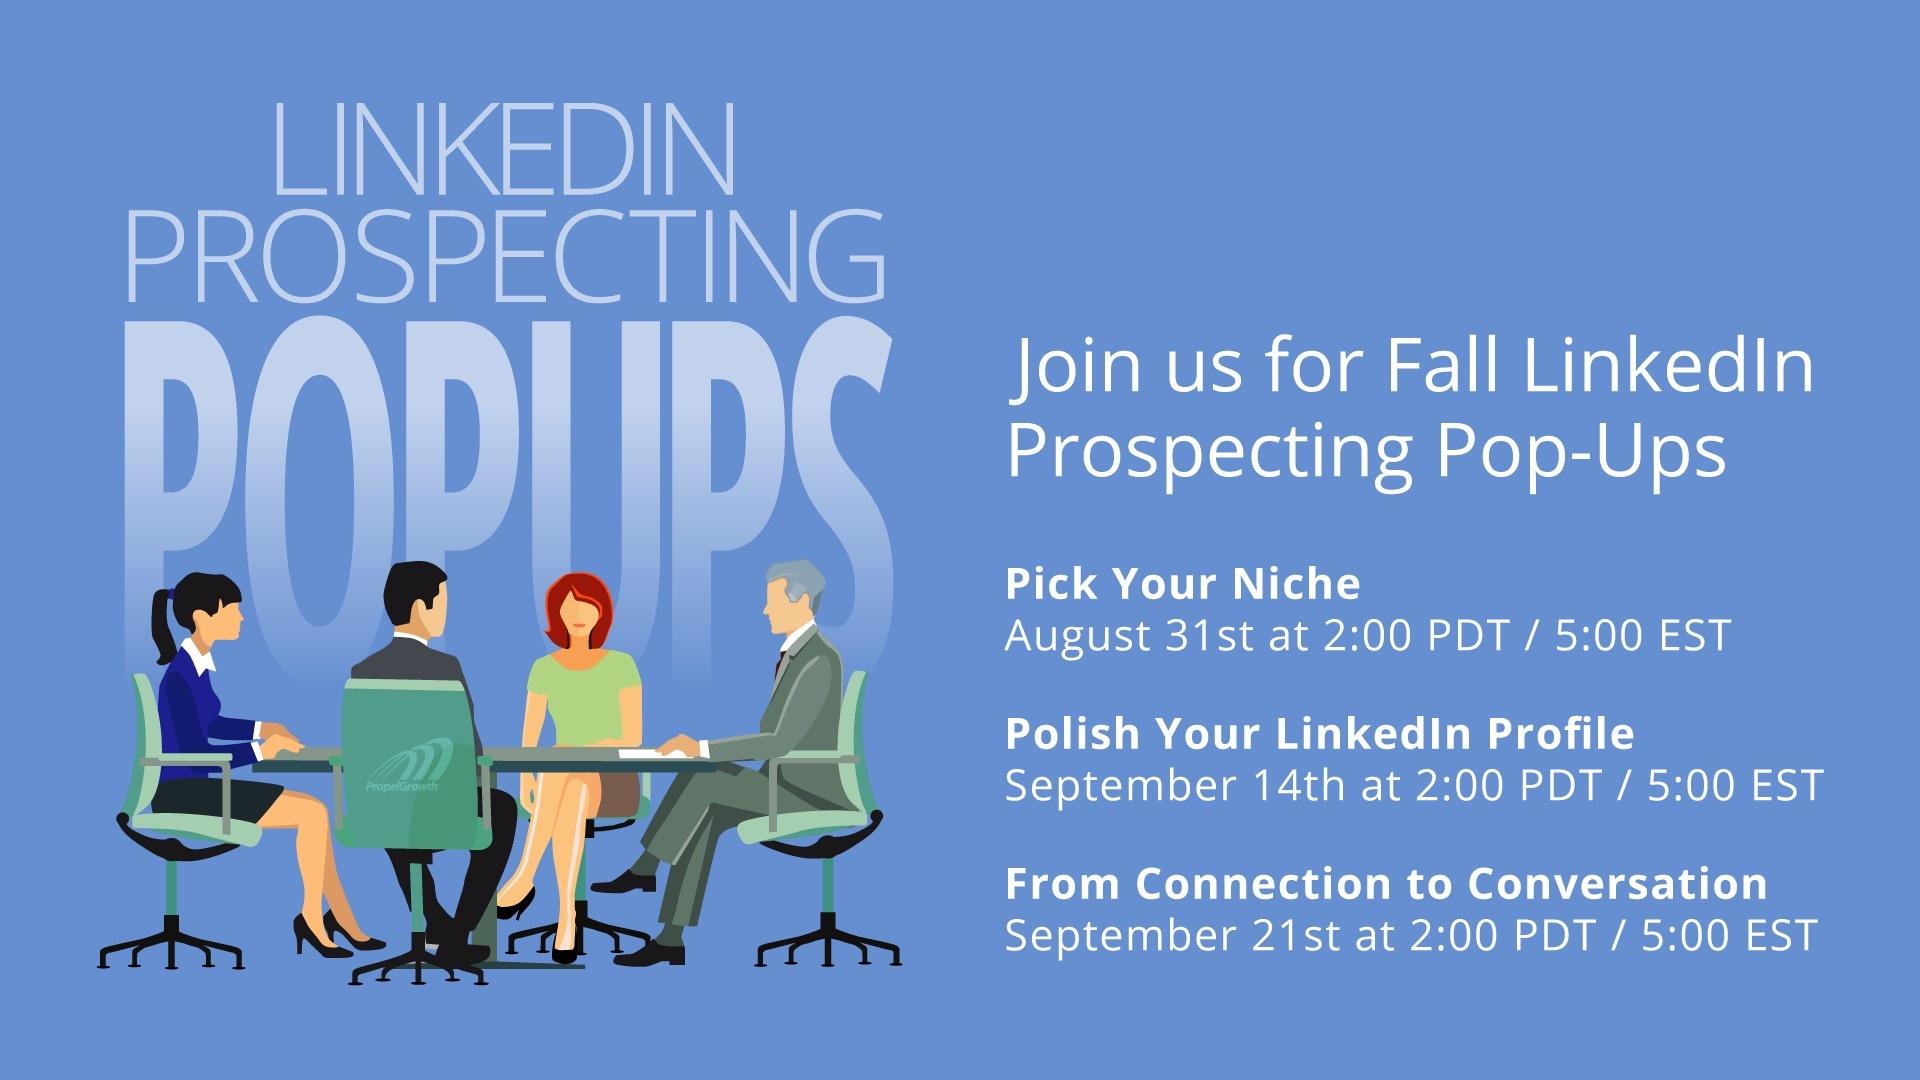 LinkedIn Prospecting Popups